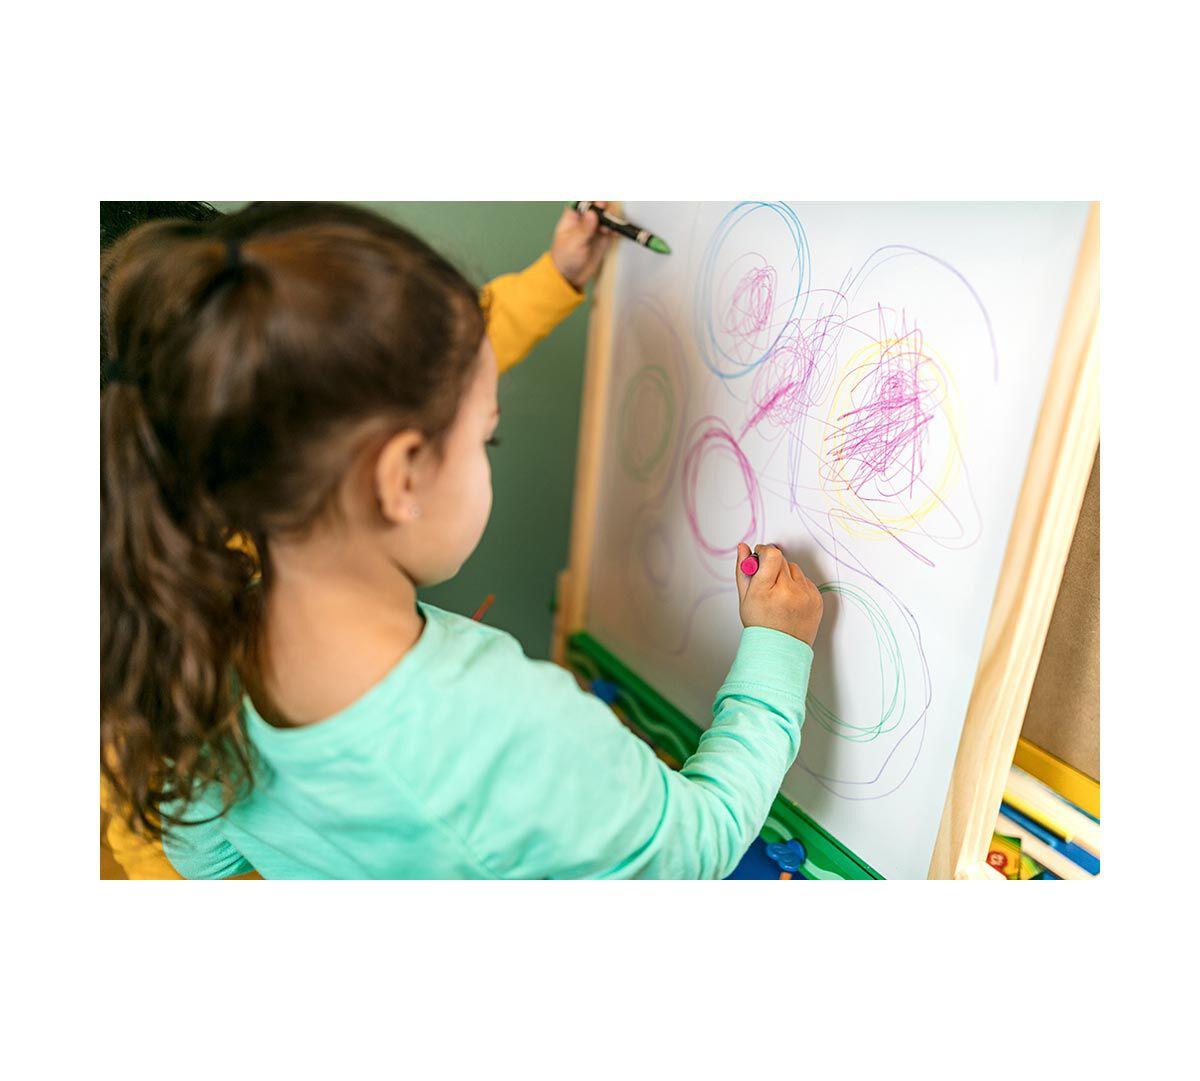 Crayola Kid' Wooden Easel Dry Erase Board & Chalkboard Kids Age 4 5 6 7